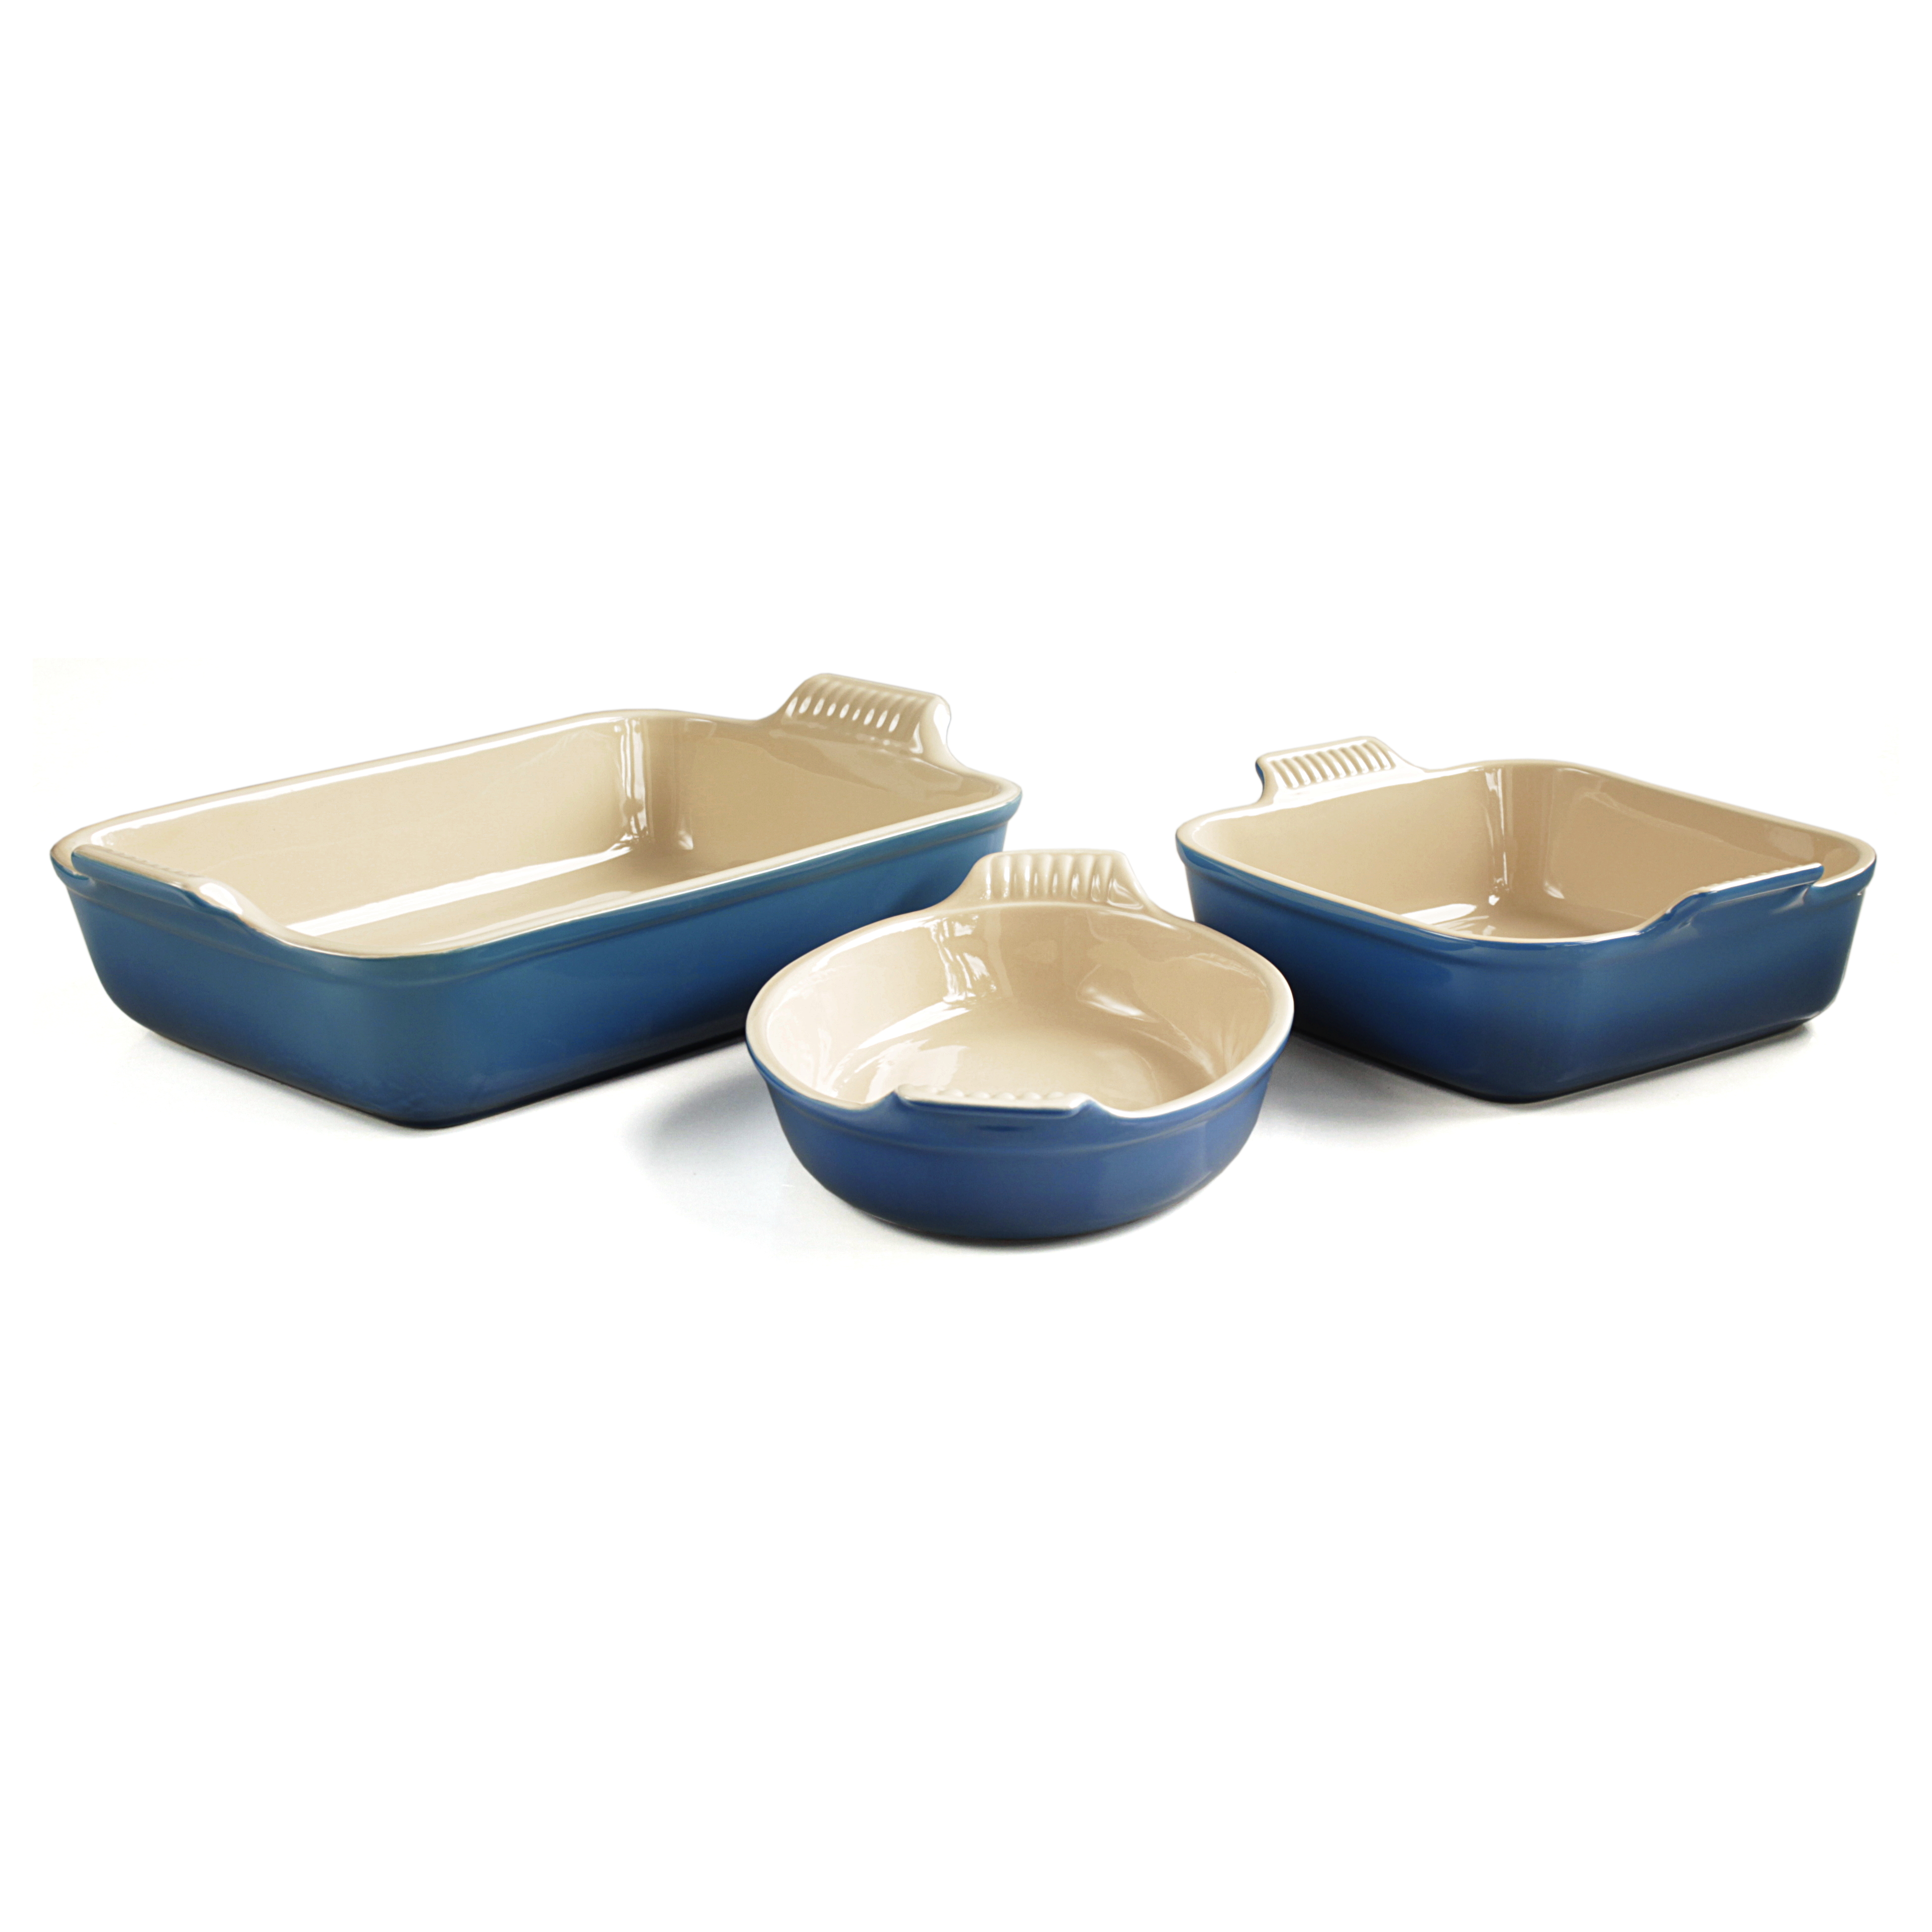 Le Creuset Heritage Marseille Blue Stoneware 3 Piece Bakeware Set